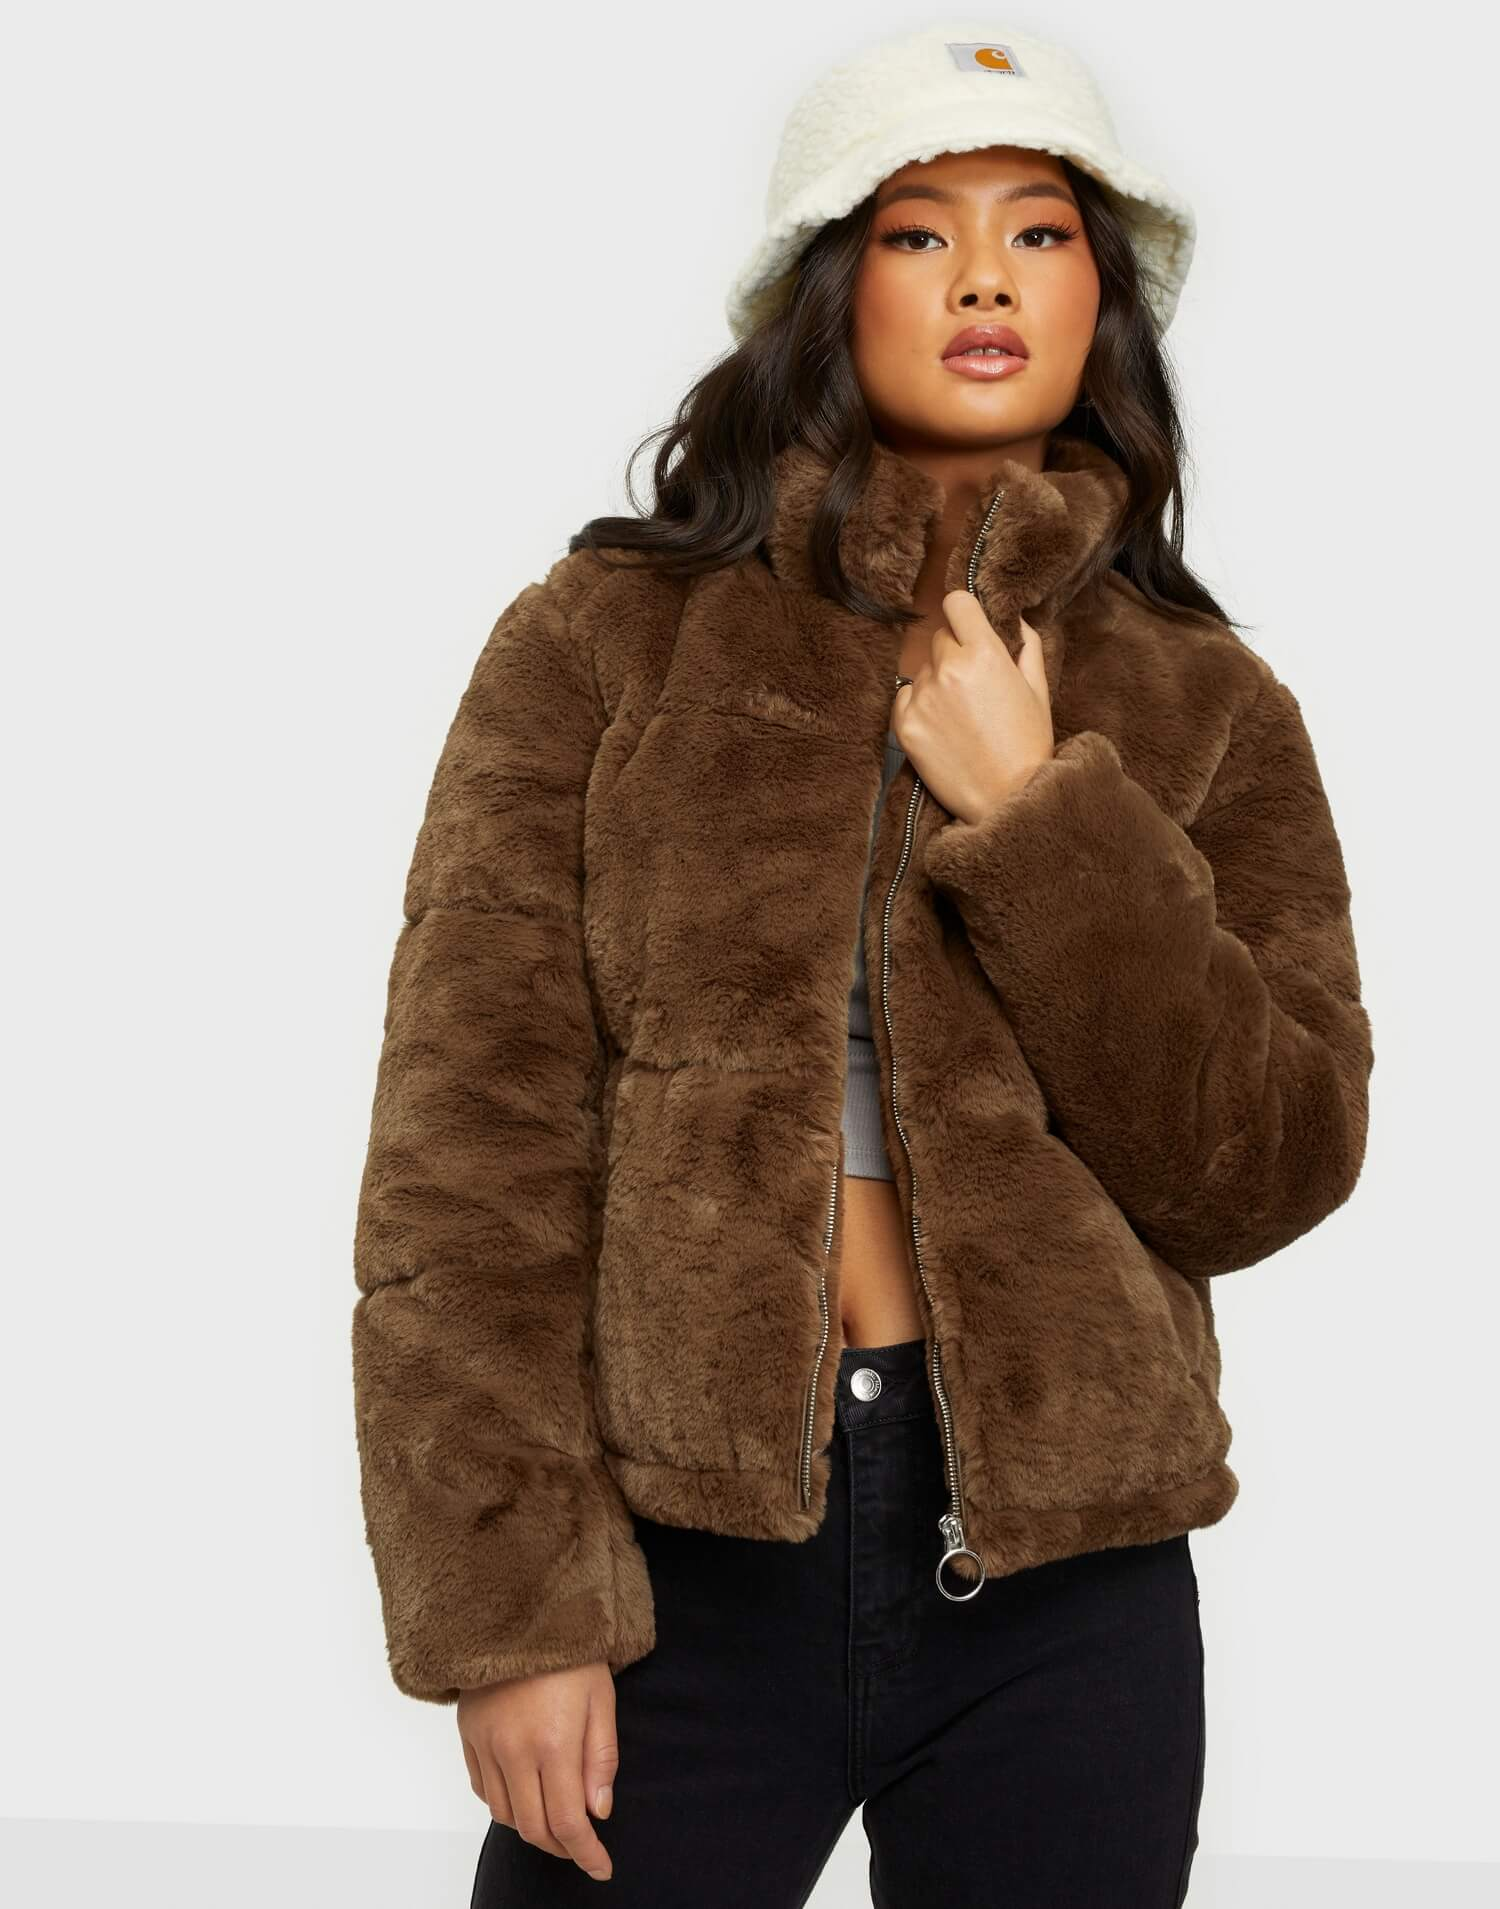 En brun fuskpälsjacka från Jaqueline de Yong.